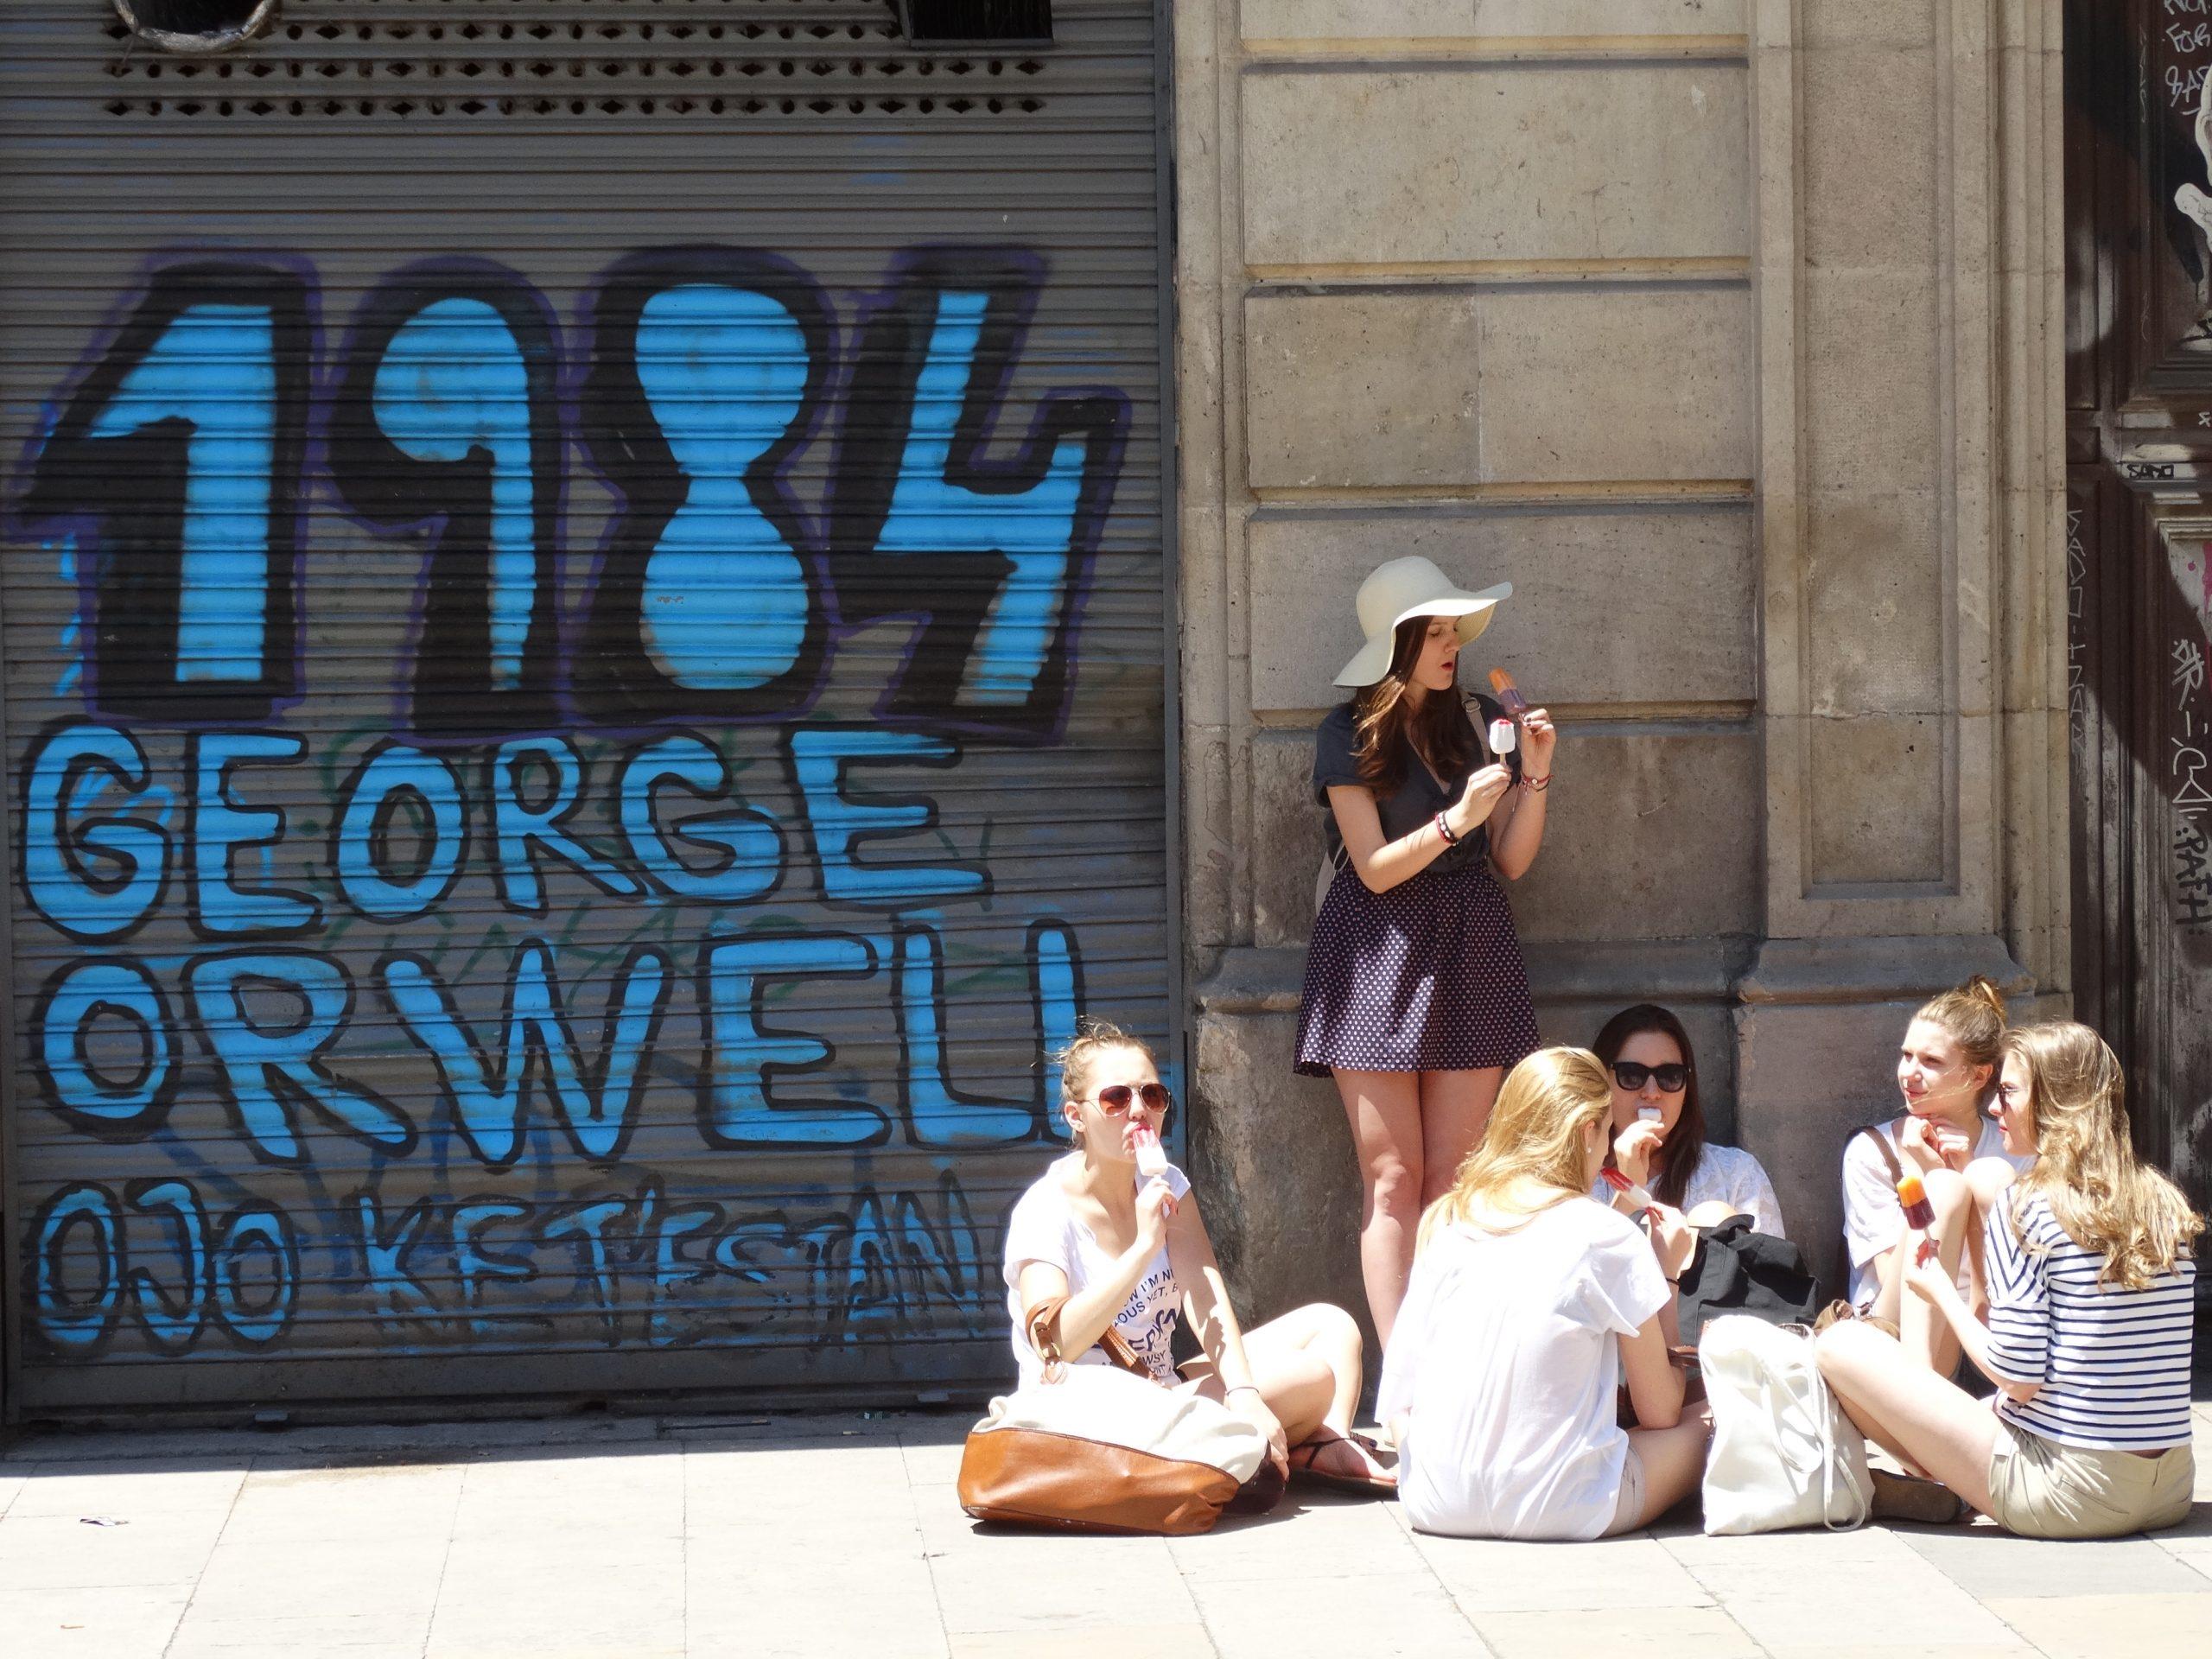 FOTO/Barcelona, 1984, Wikimedia Commons